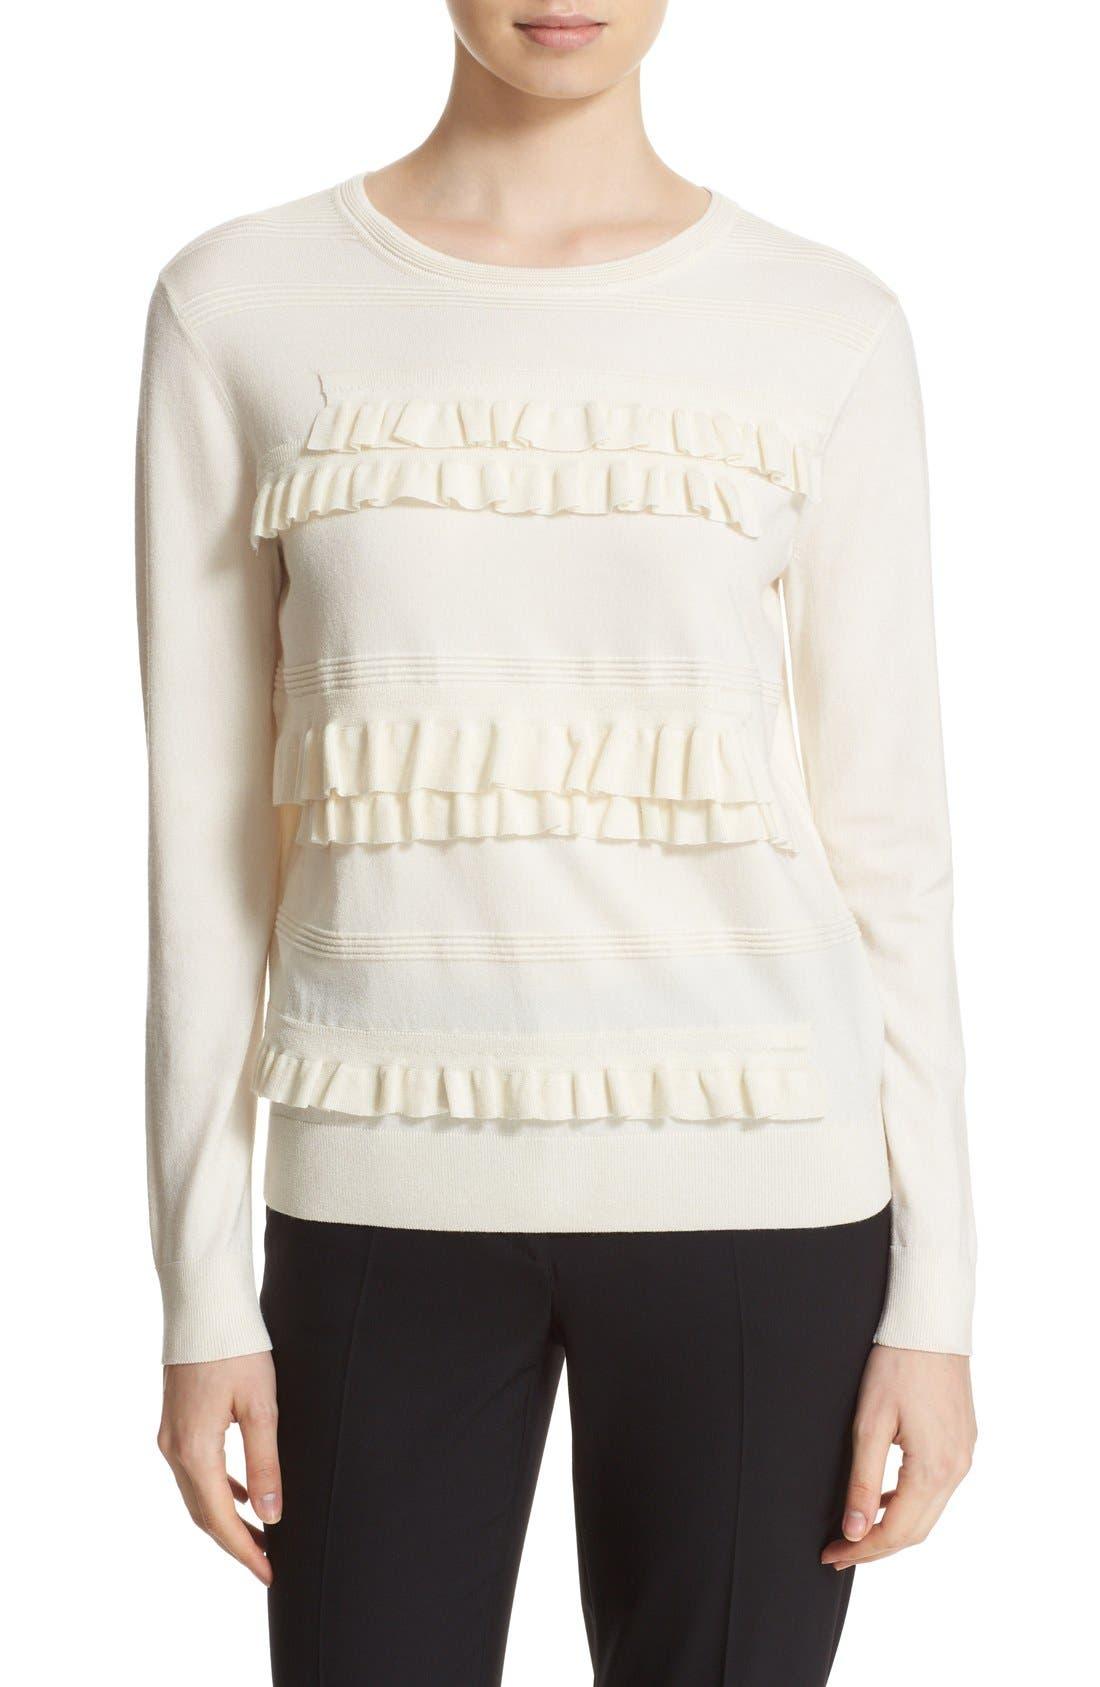 Alternate Image 1 Selected - Diane von Furstenberg 'Benni' Sweater